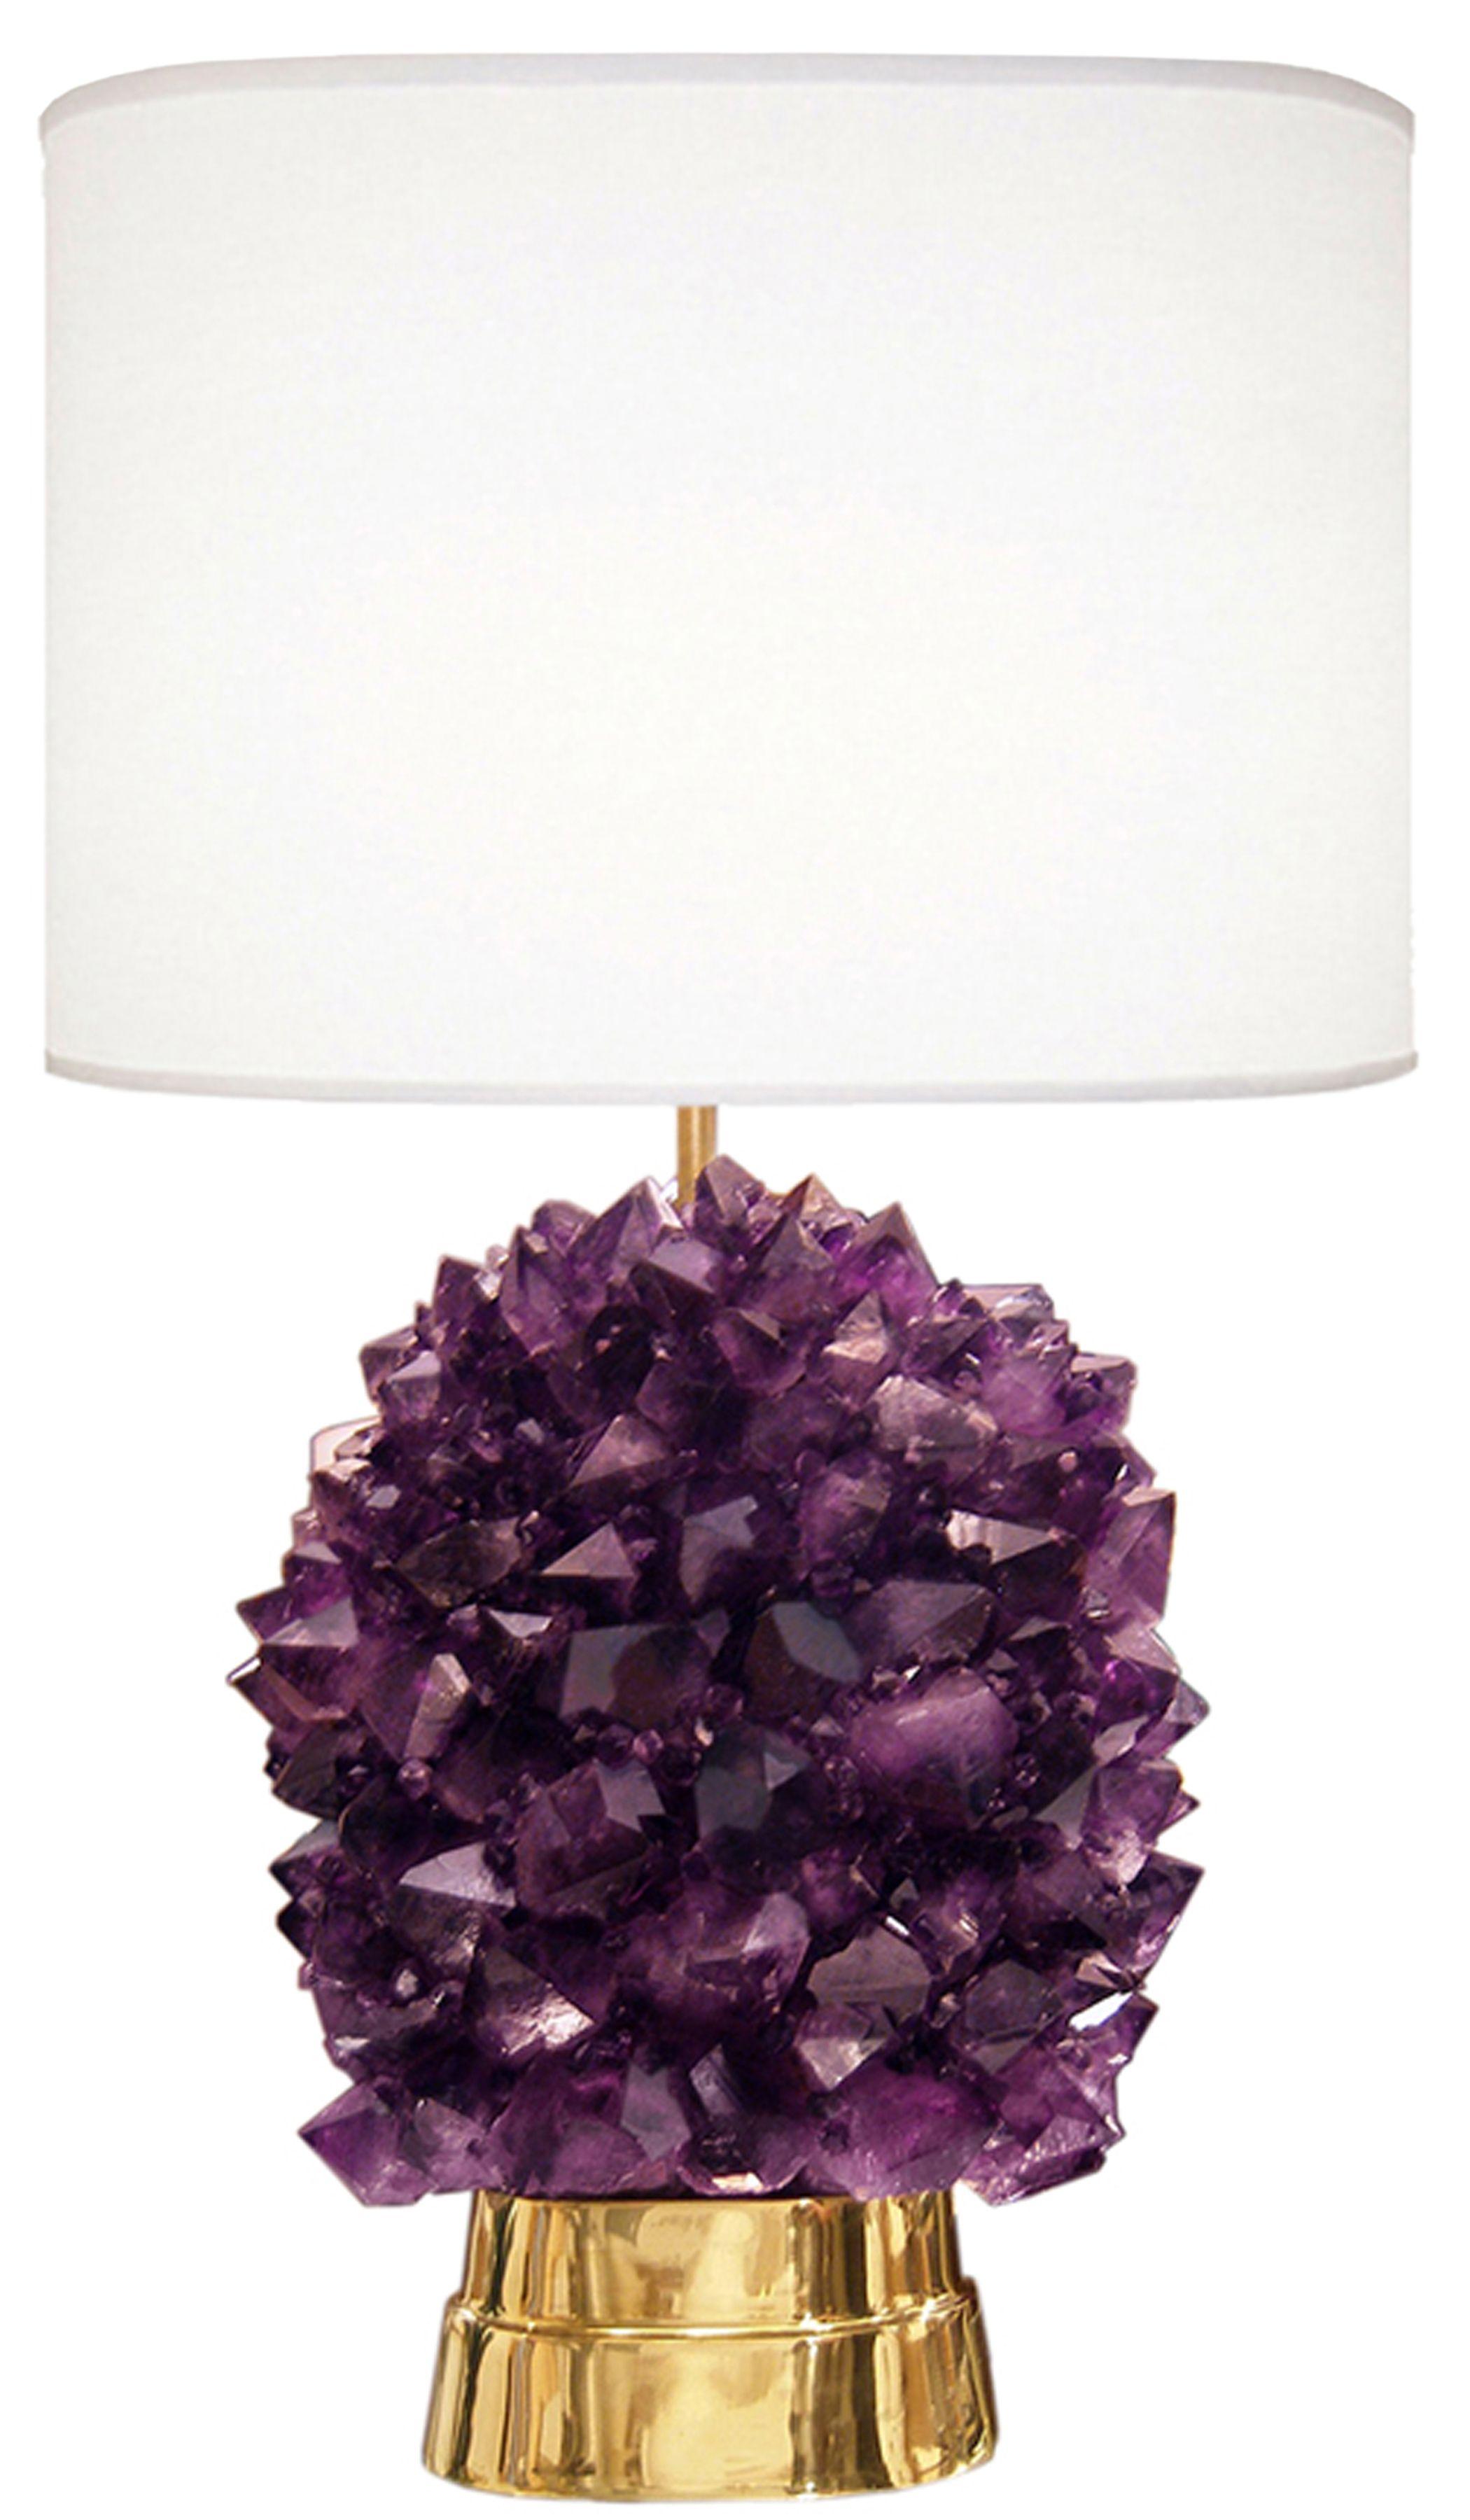 Buy Amethyst Rock Crystal Lamp From Craig Van Den Brulle On Dering Hall Crystal Lamp Modern Table Lighting Amethyst Rock